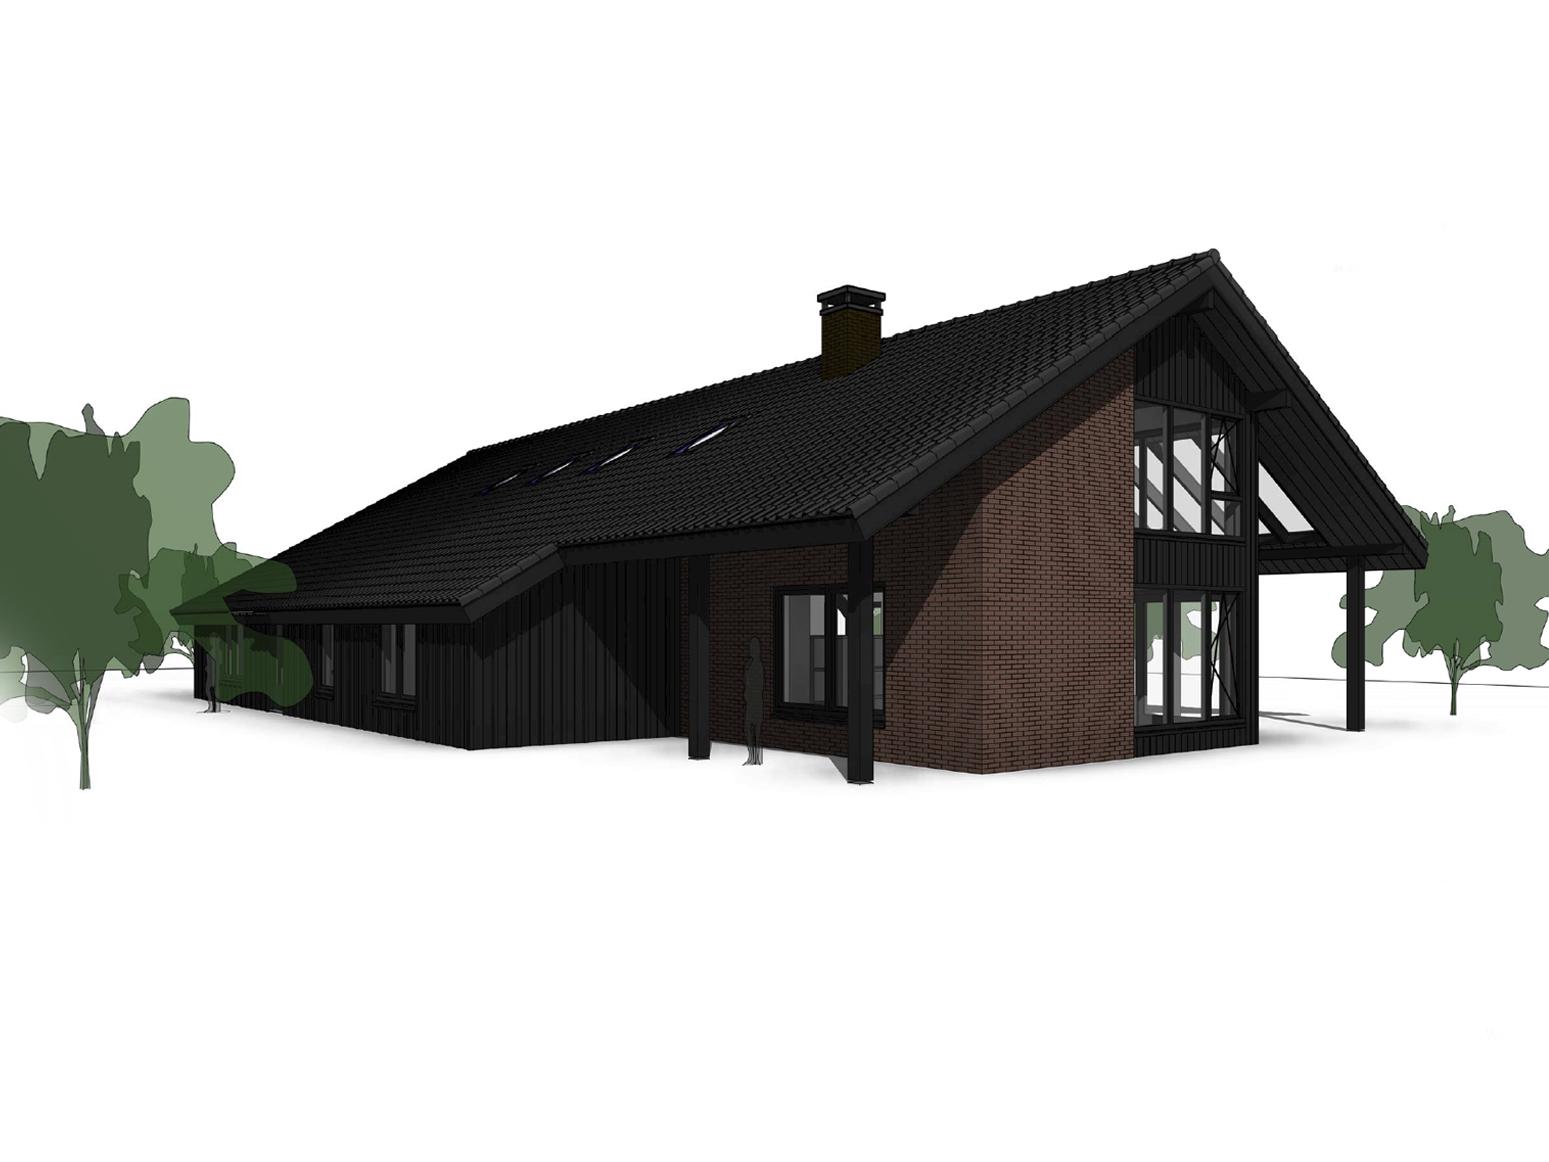 stoer-schuurwoning-klarenbeek-metselwerk-donker-van-oord-architectuur-en-design-wenum-wiesel-architect-voorst-architect-apeldoorn-3